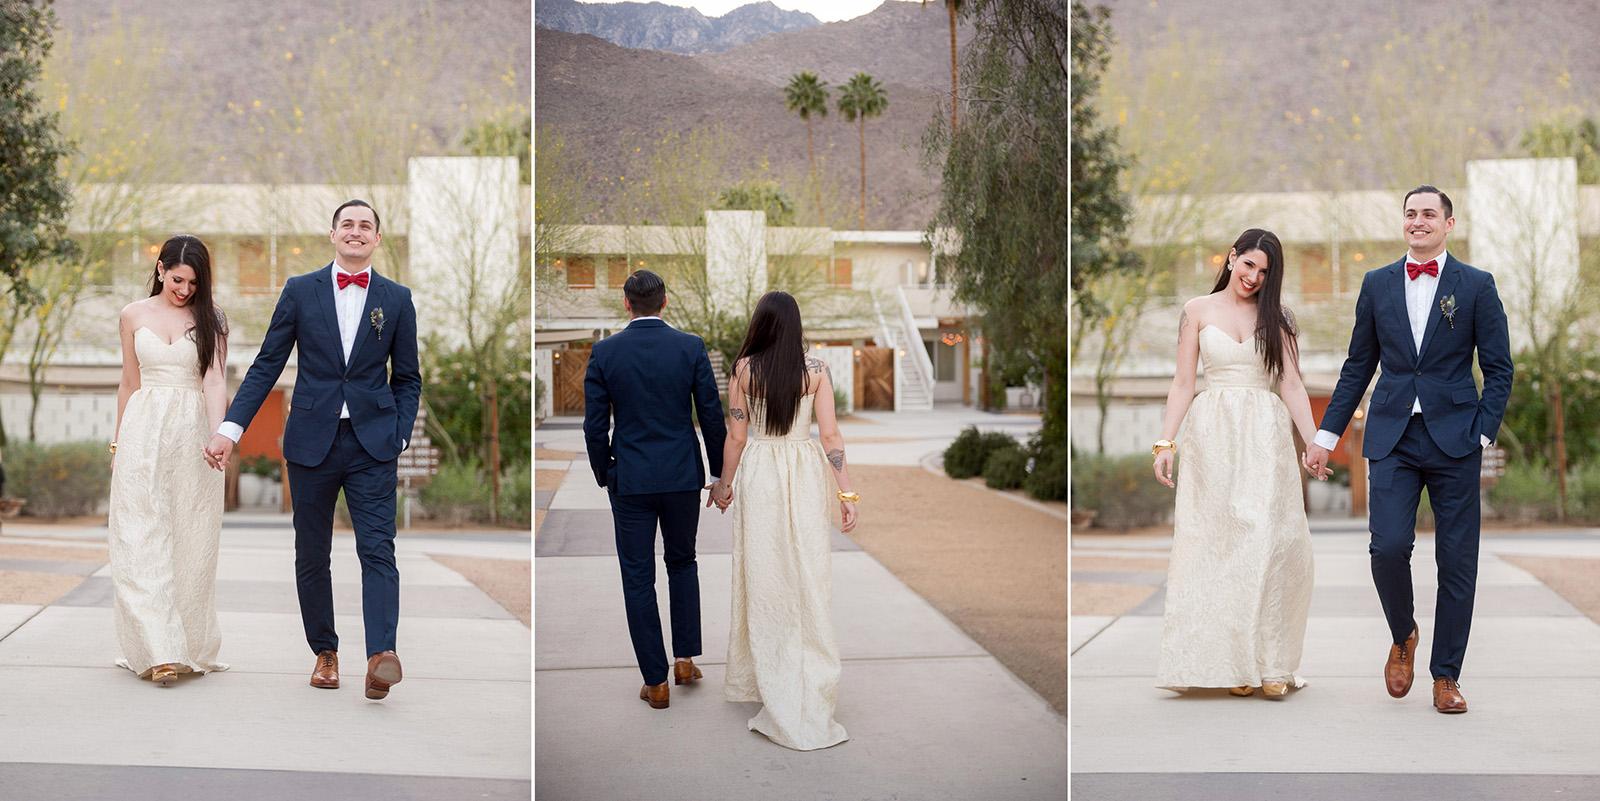 ace-hotel-palm-springs-wedding-54.jpg